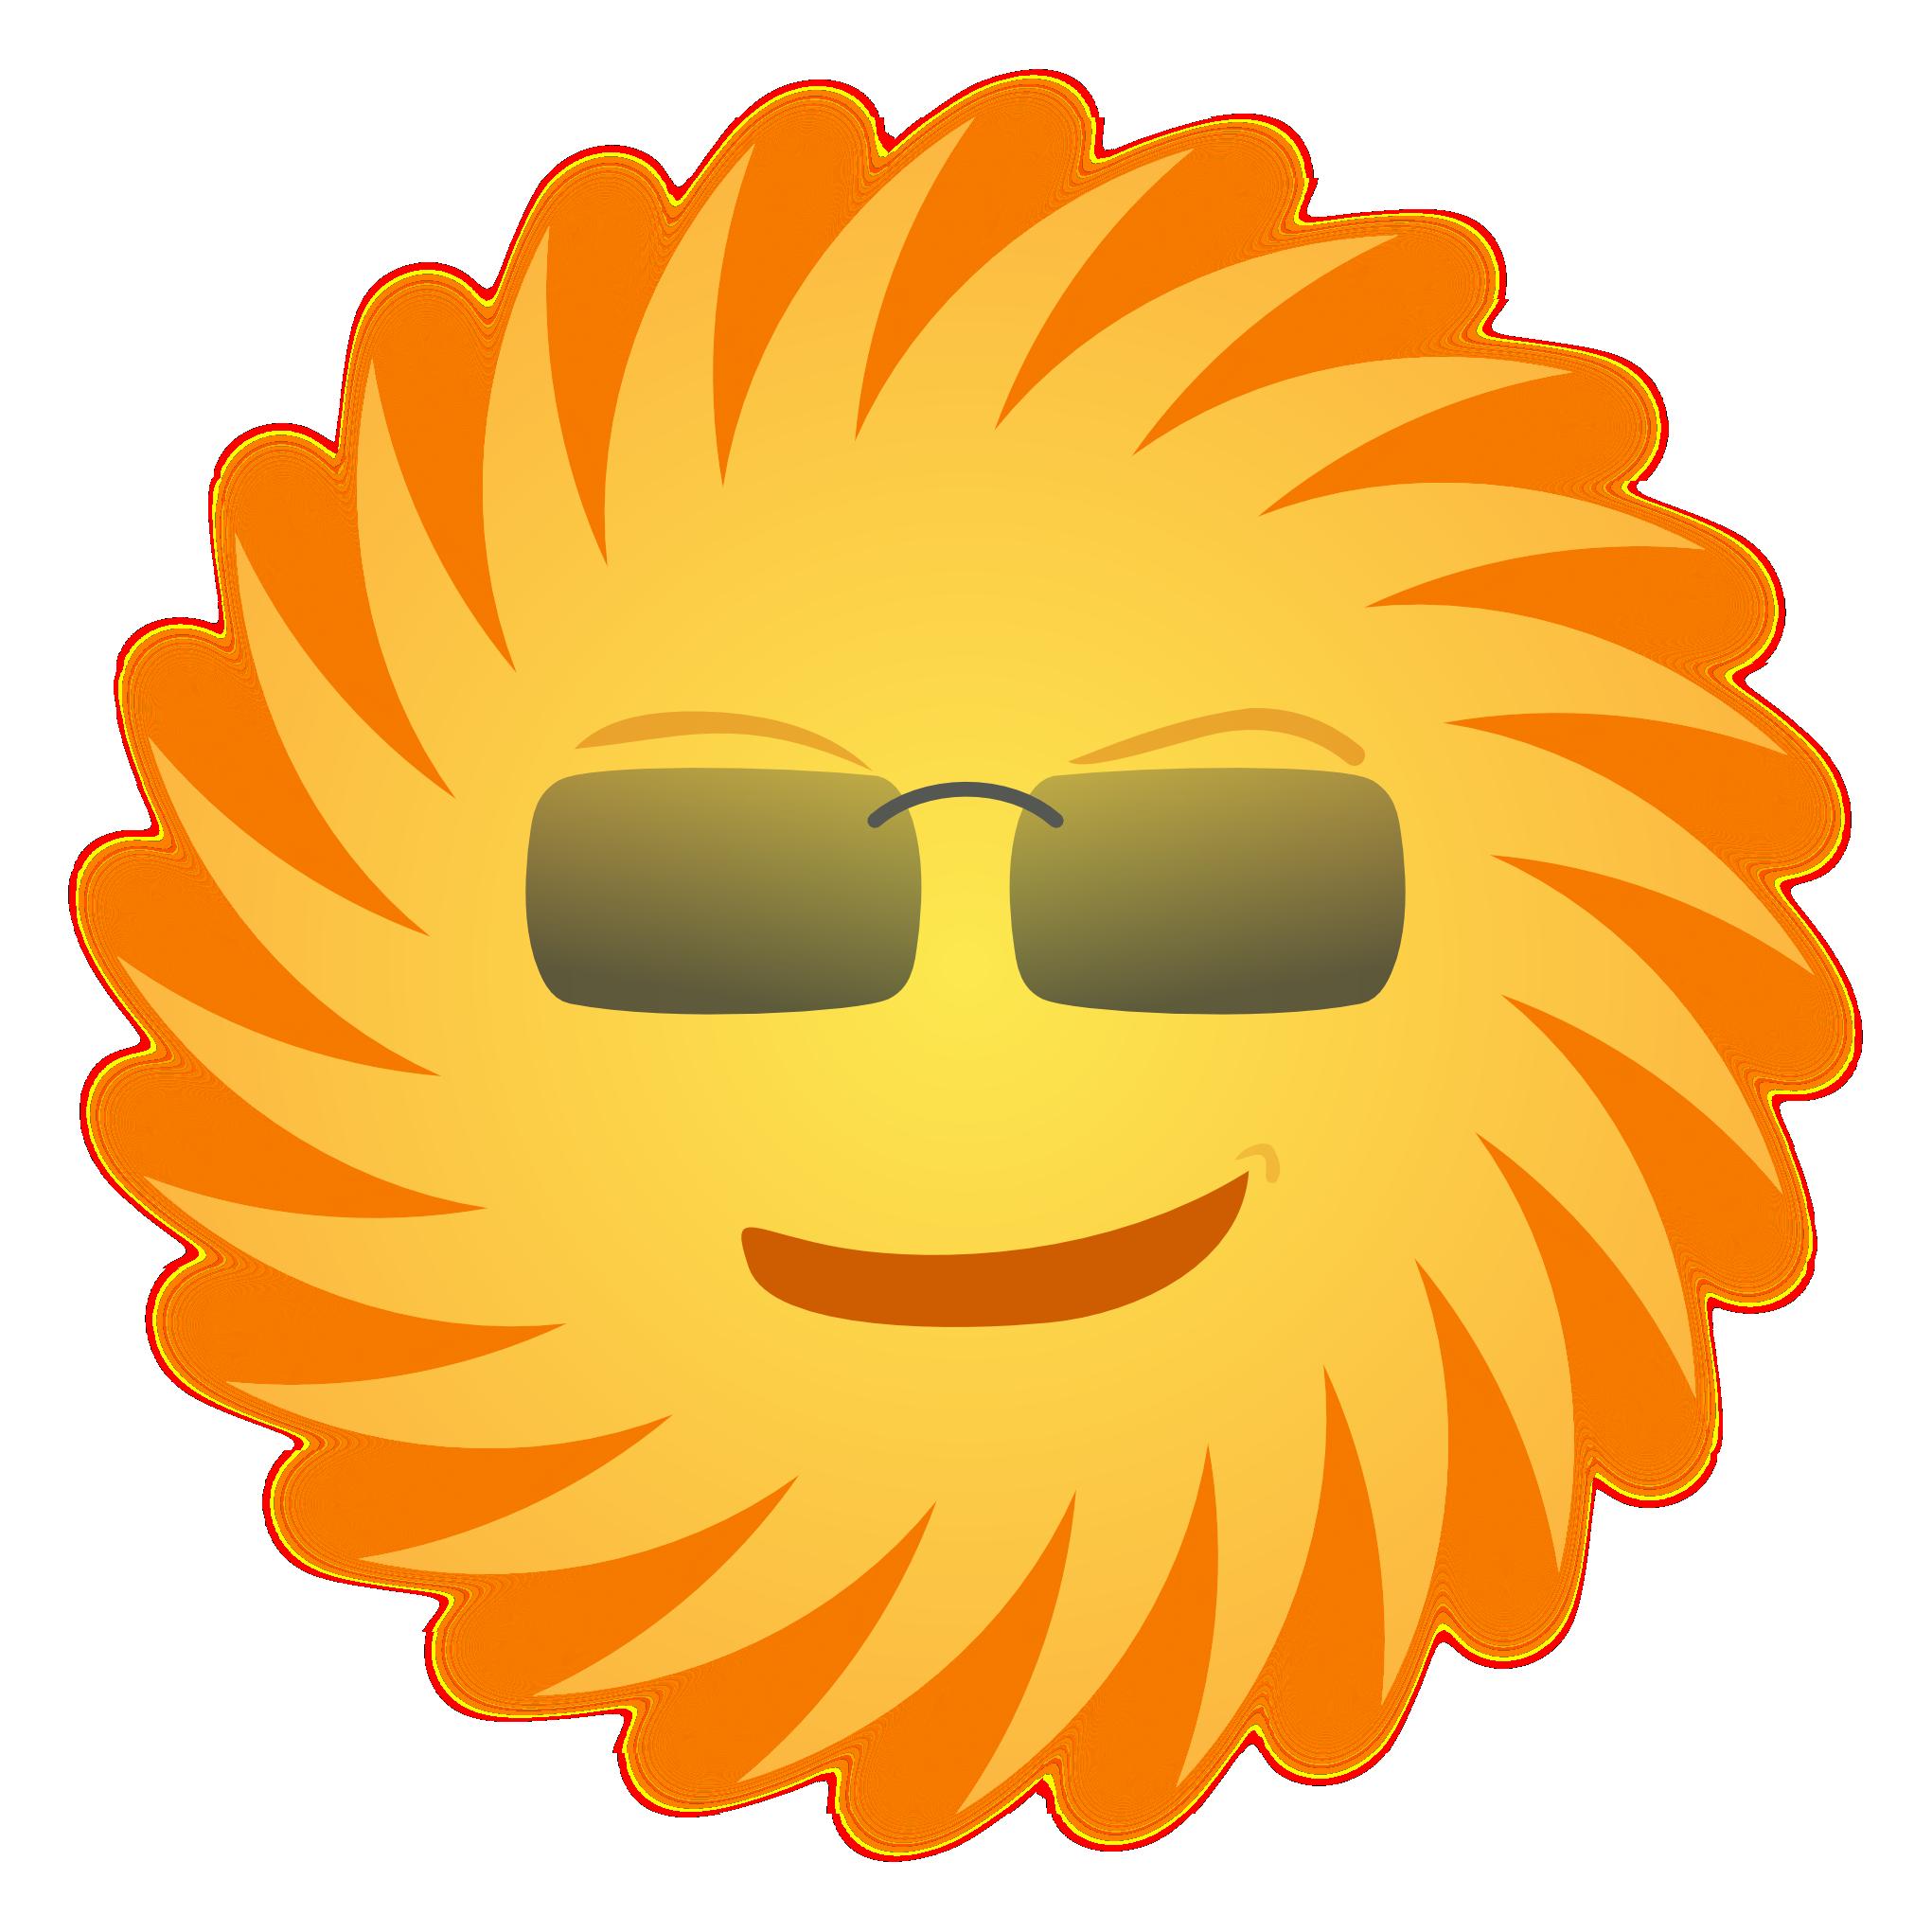 Png Hot Sun - Sun Png Transparent Image, Transparent background PNG HD thumbnail